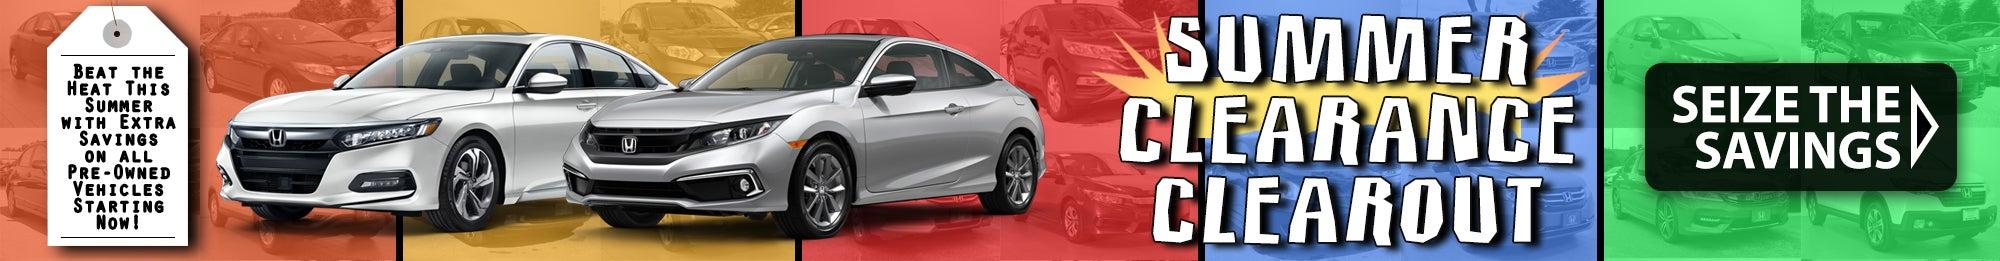 Honda Dealership Orange County >> Middleburg Heights Honda Dealer In Middleburg Heights Oh New And